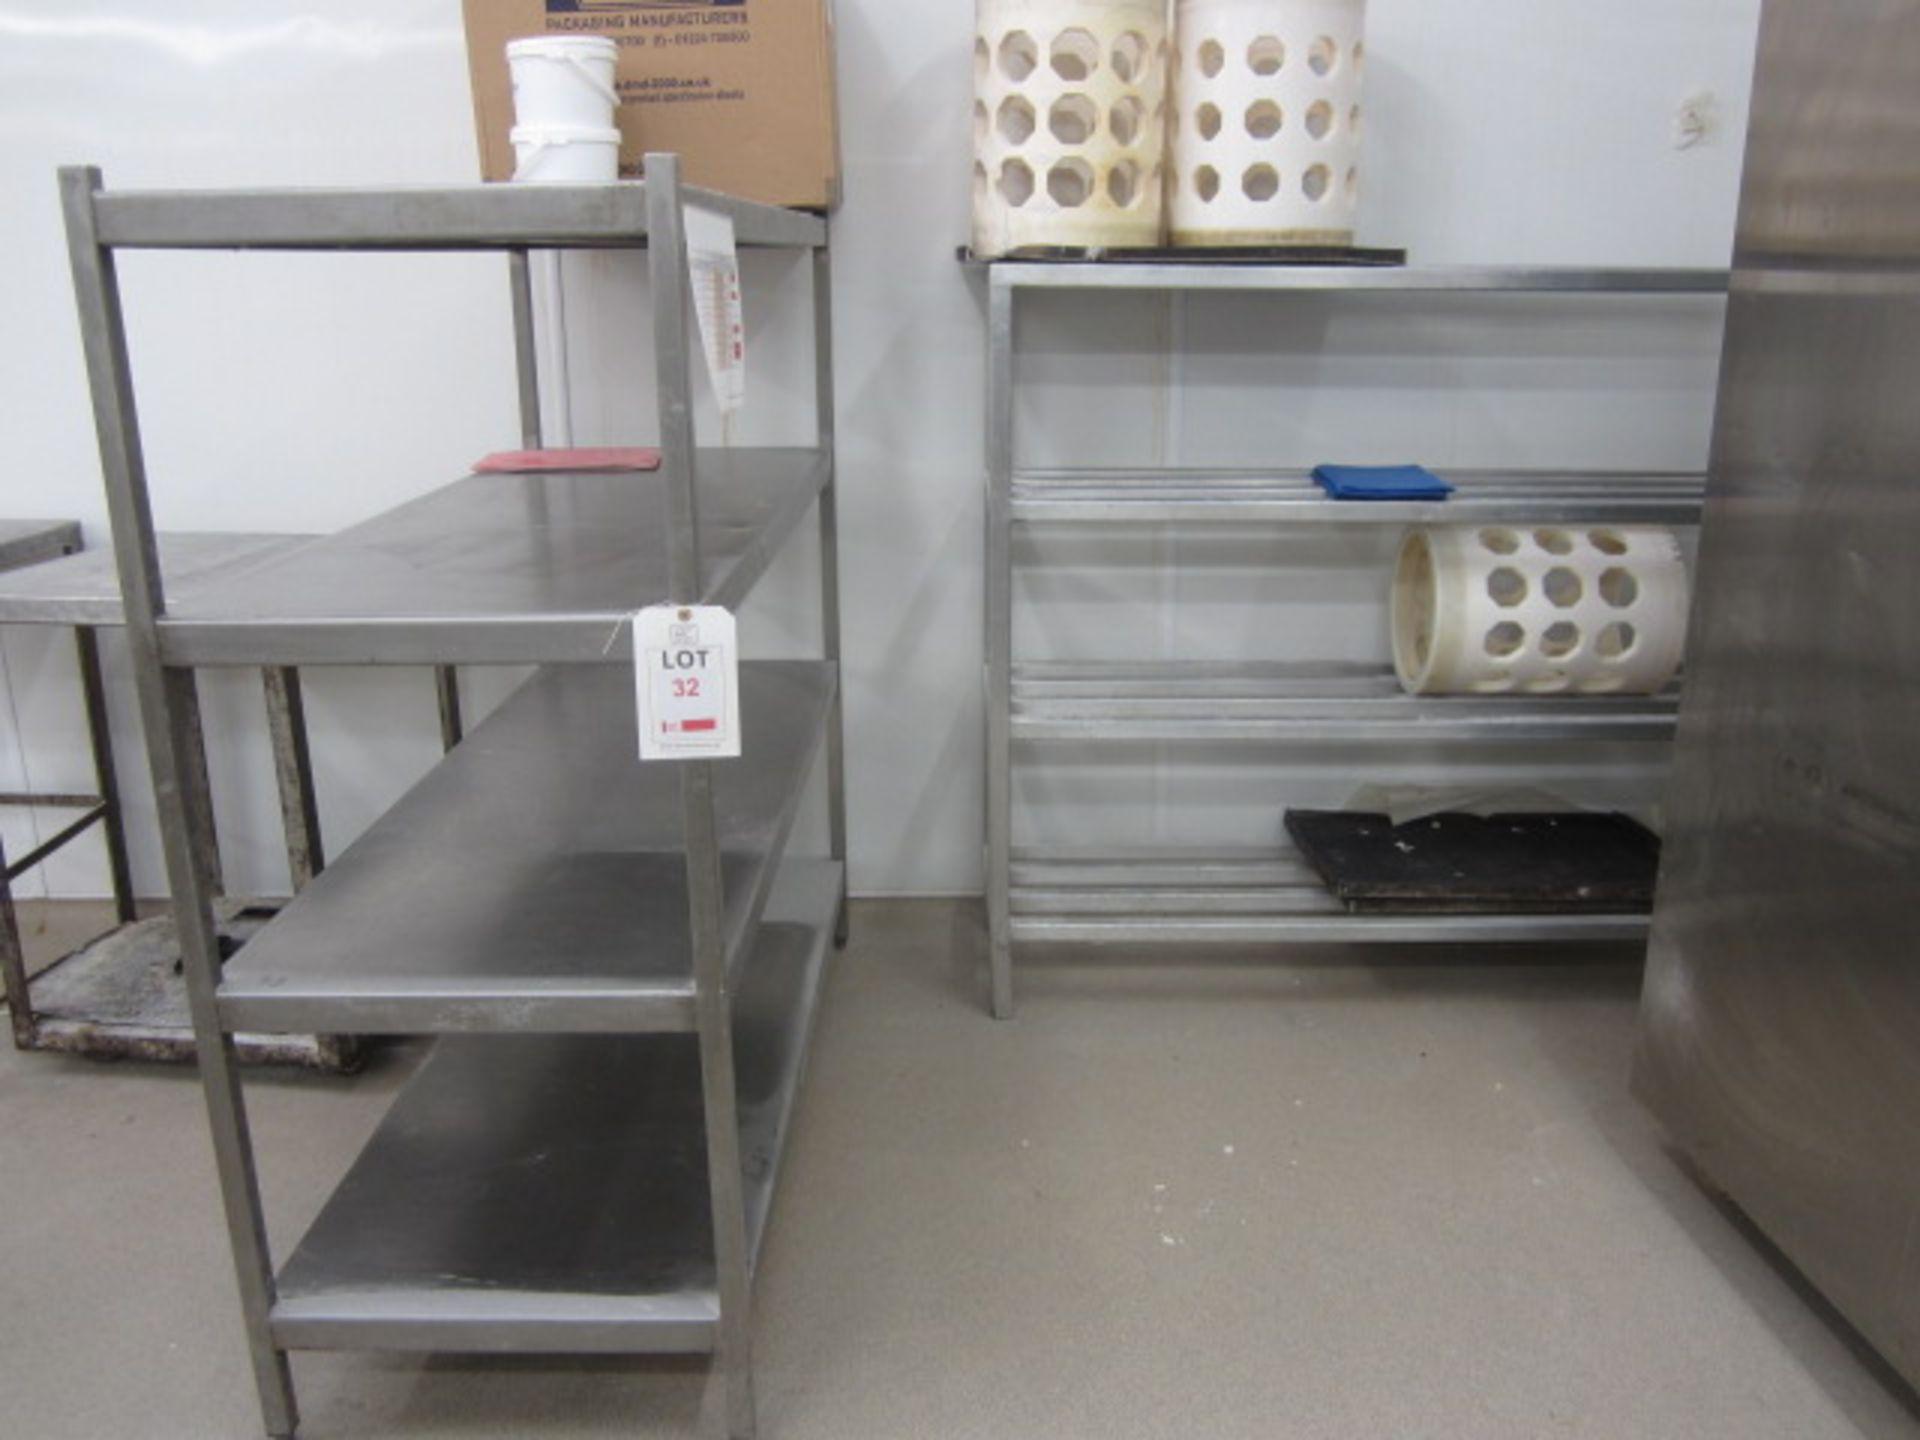 Lot 32 - Stainless steel 4-shelf storage rack. Approx., 1500 x 600 x 1650mm and stainless steel 4-shelf